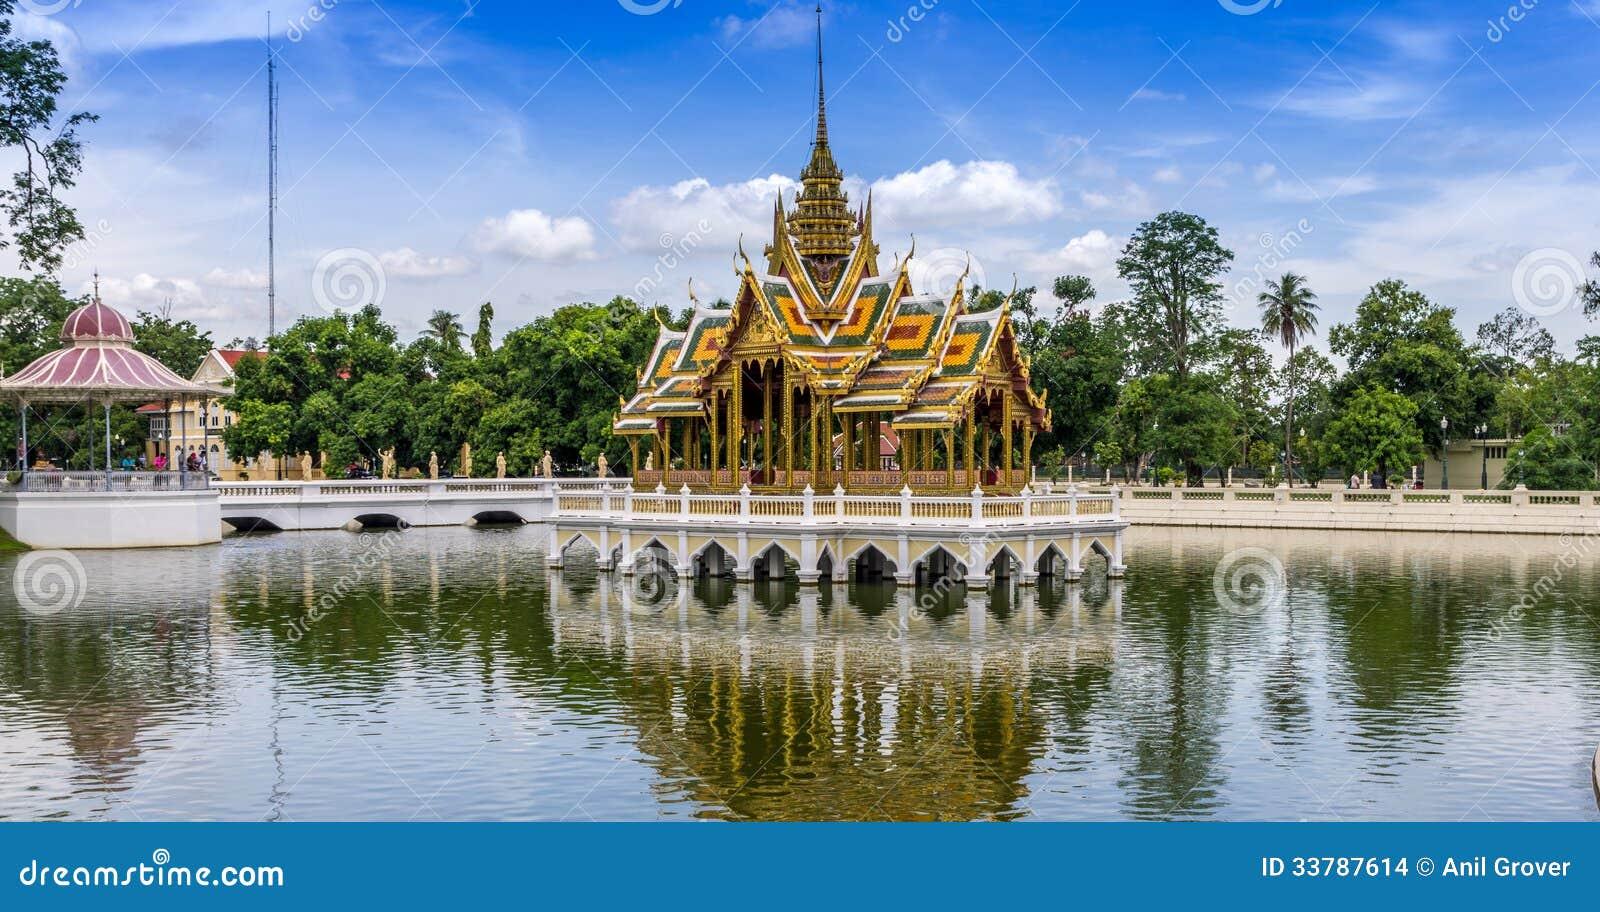 royal thai erotik på film